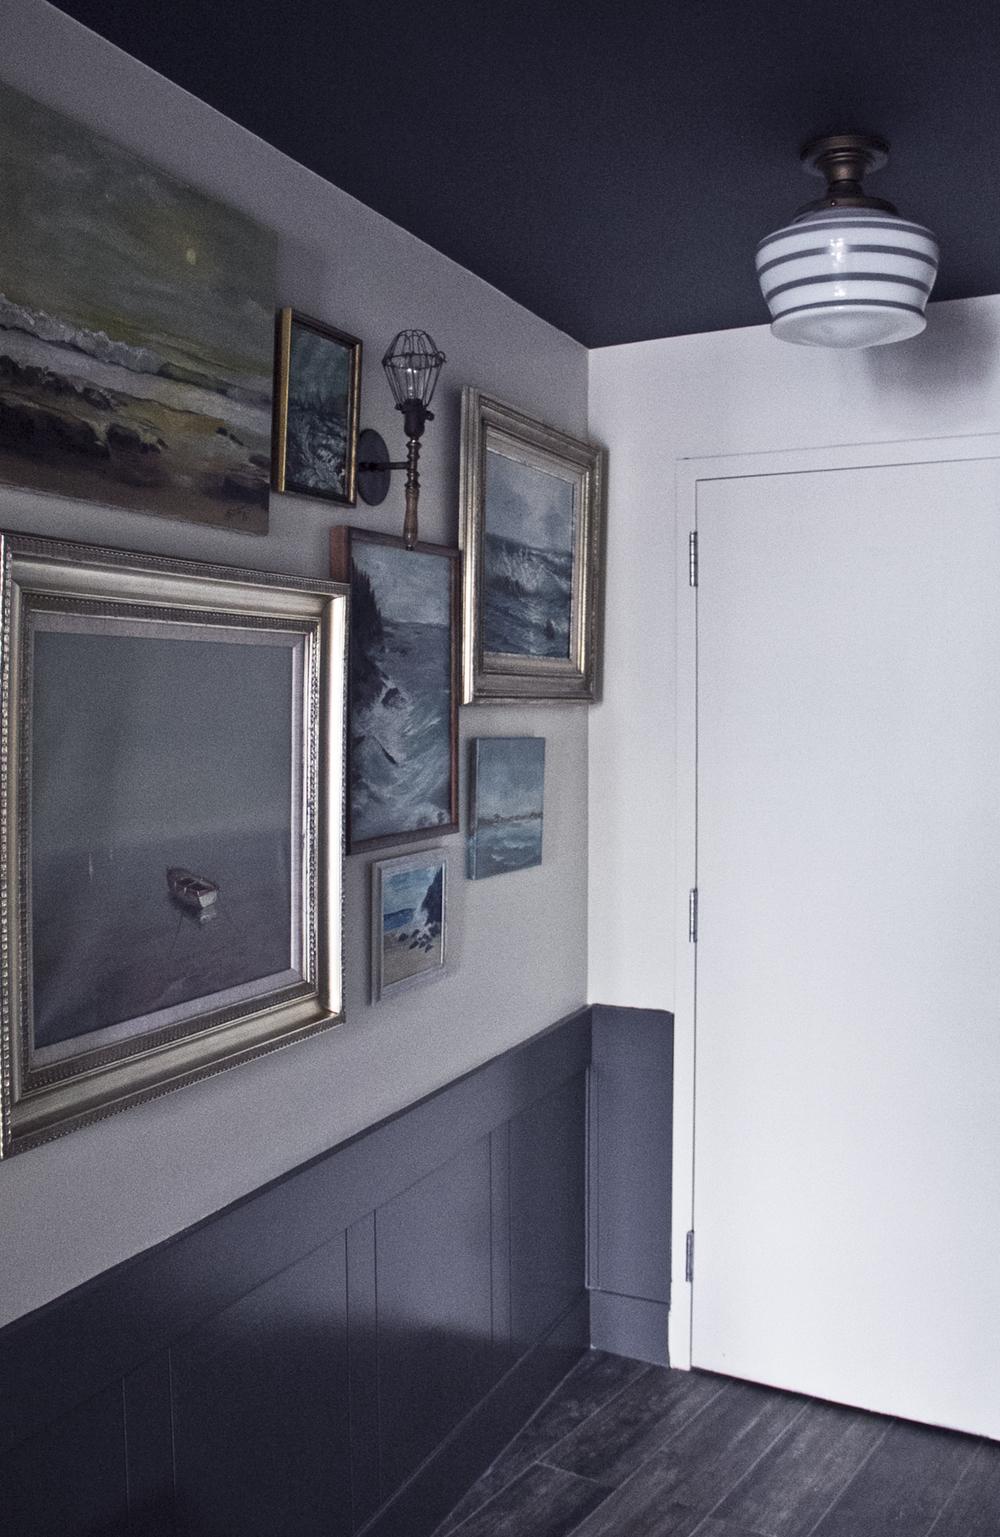 aqua-collage wall.jpg